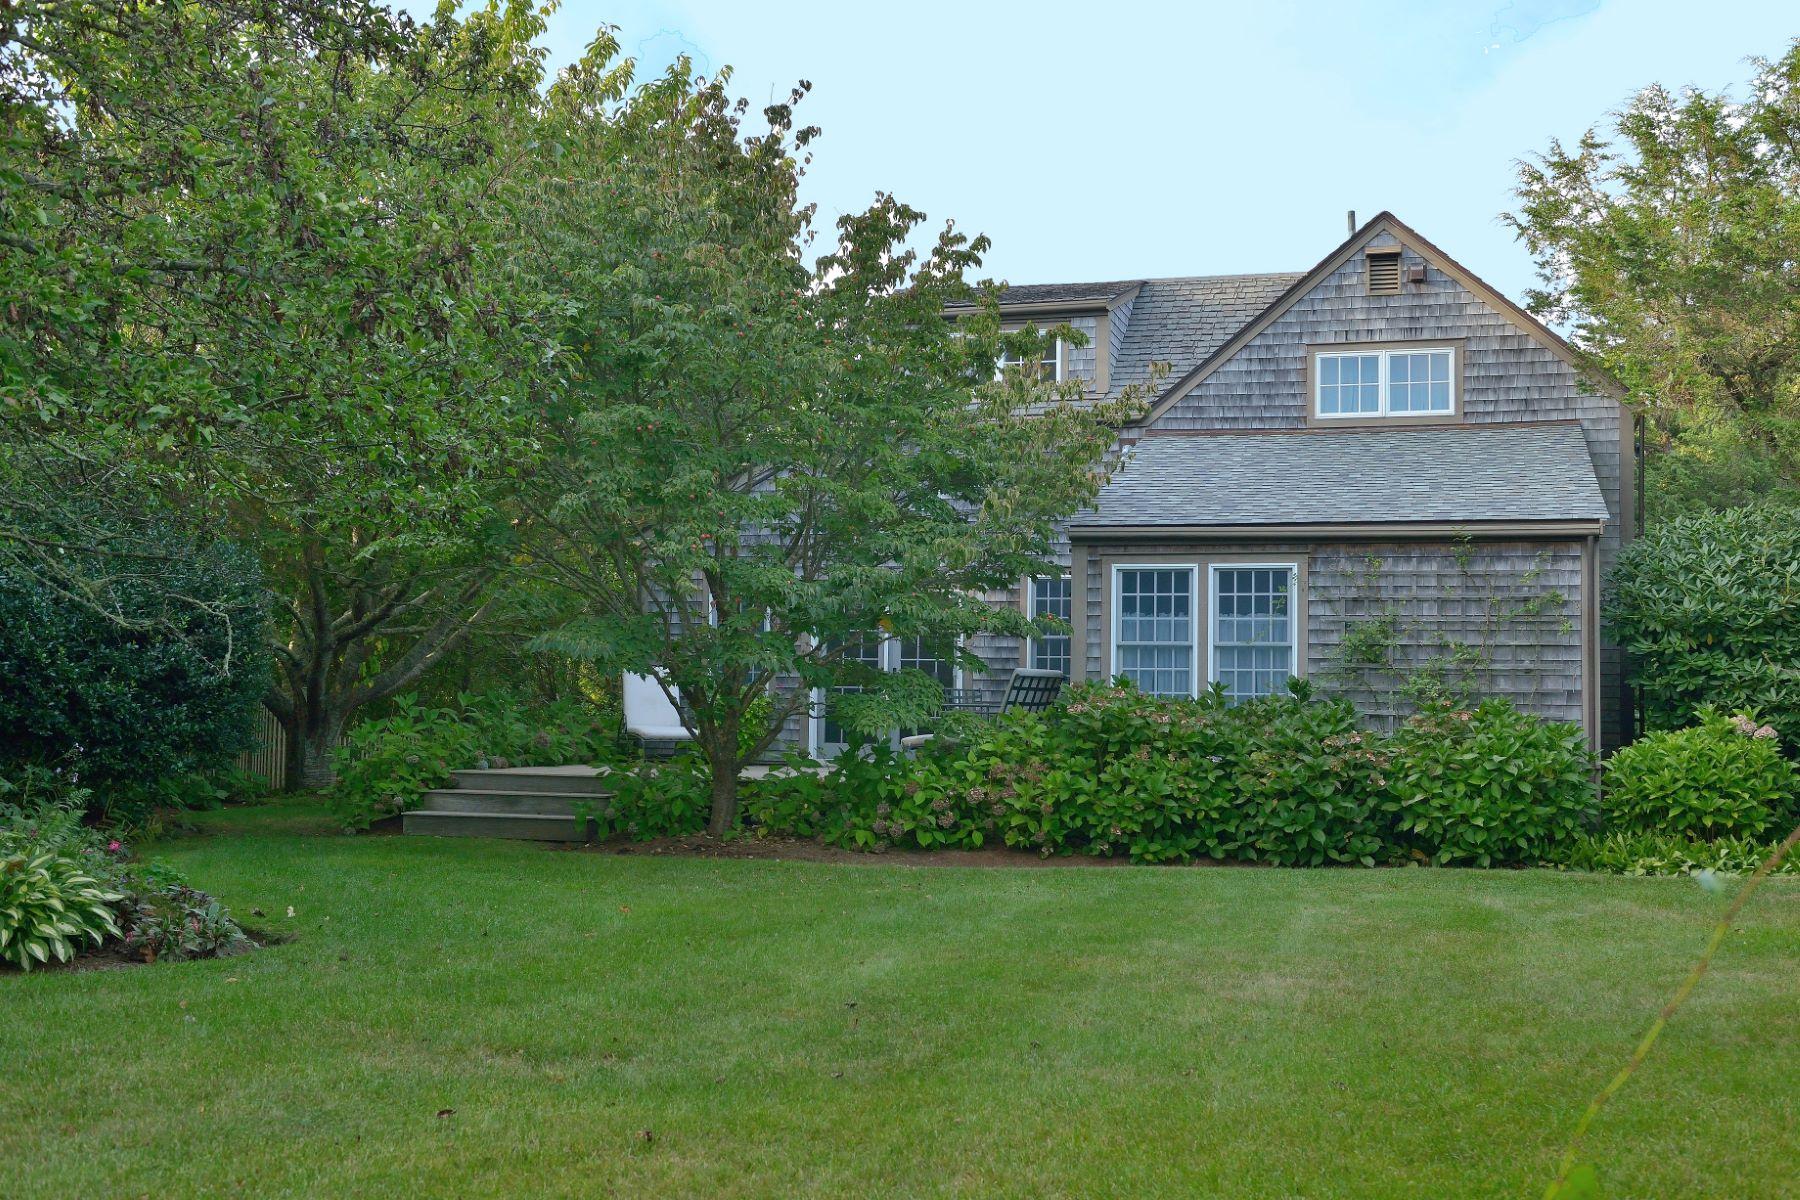 Частный односемейный дом для того Продажа на Sconset - Tucked in and very Private. 4 Burnell Street Siasconset, Массачусетс, 02564 Соединенные Штаты